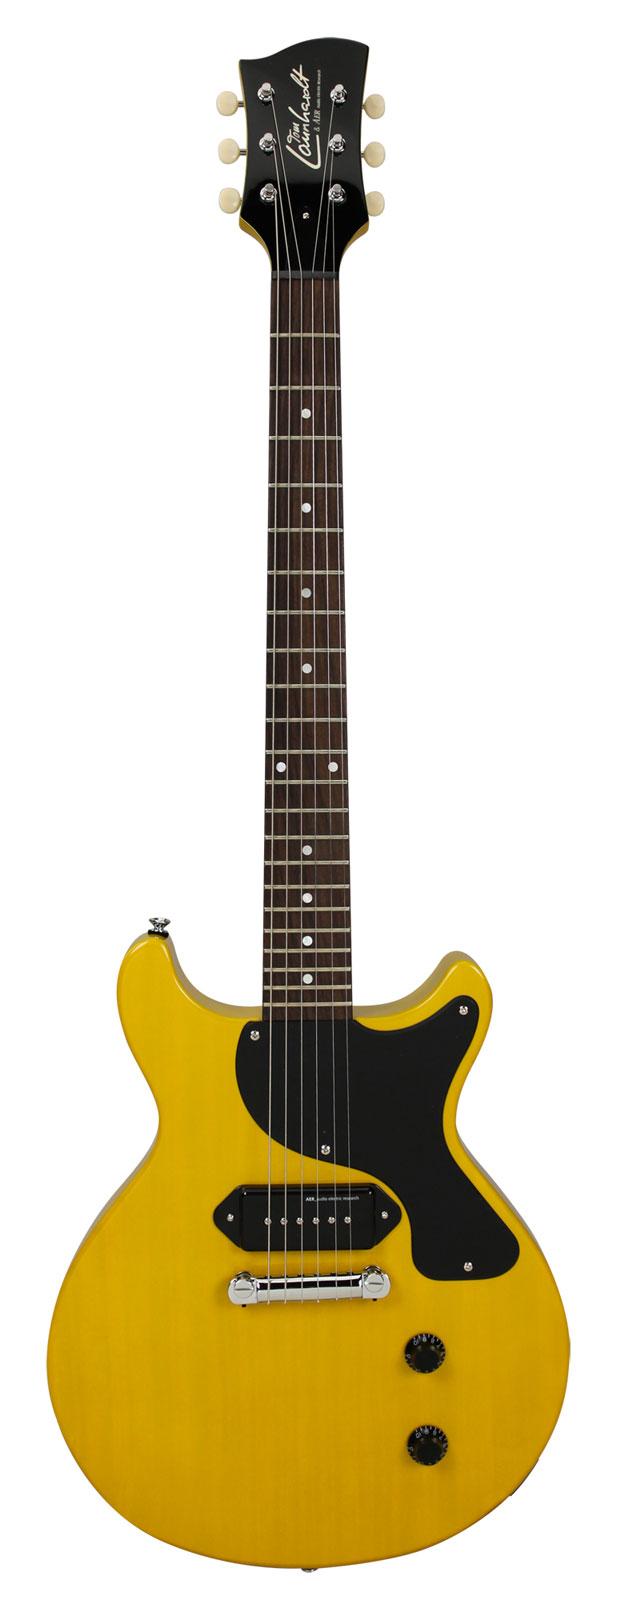 tom launhardt junior vintage yellow guitares electriques. Black Bedroom Furniture Sets. Home Design Ideas